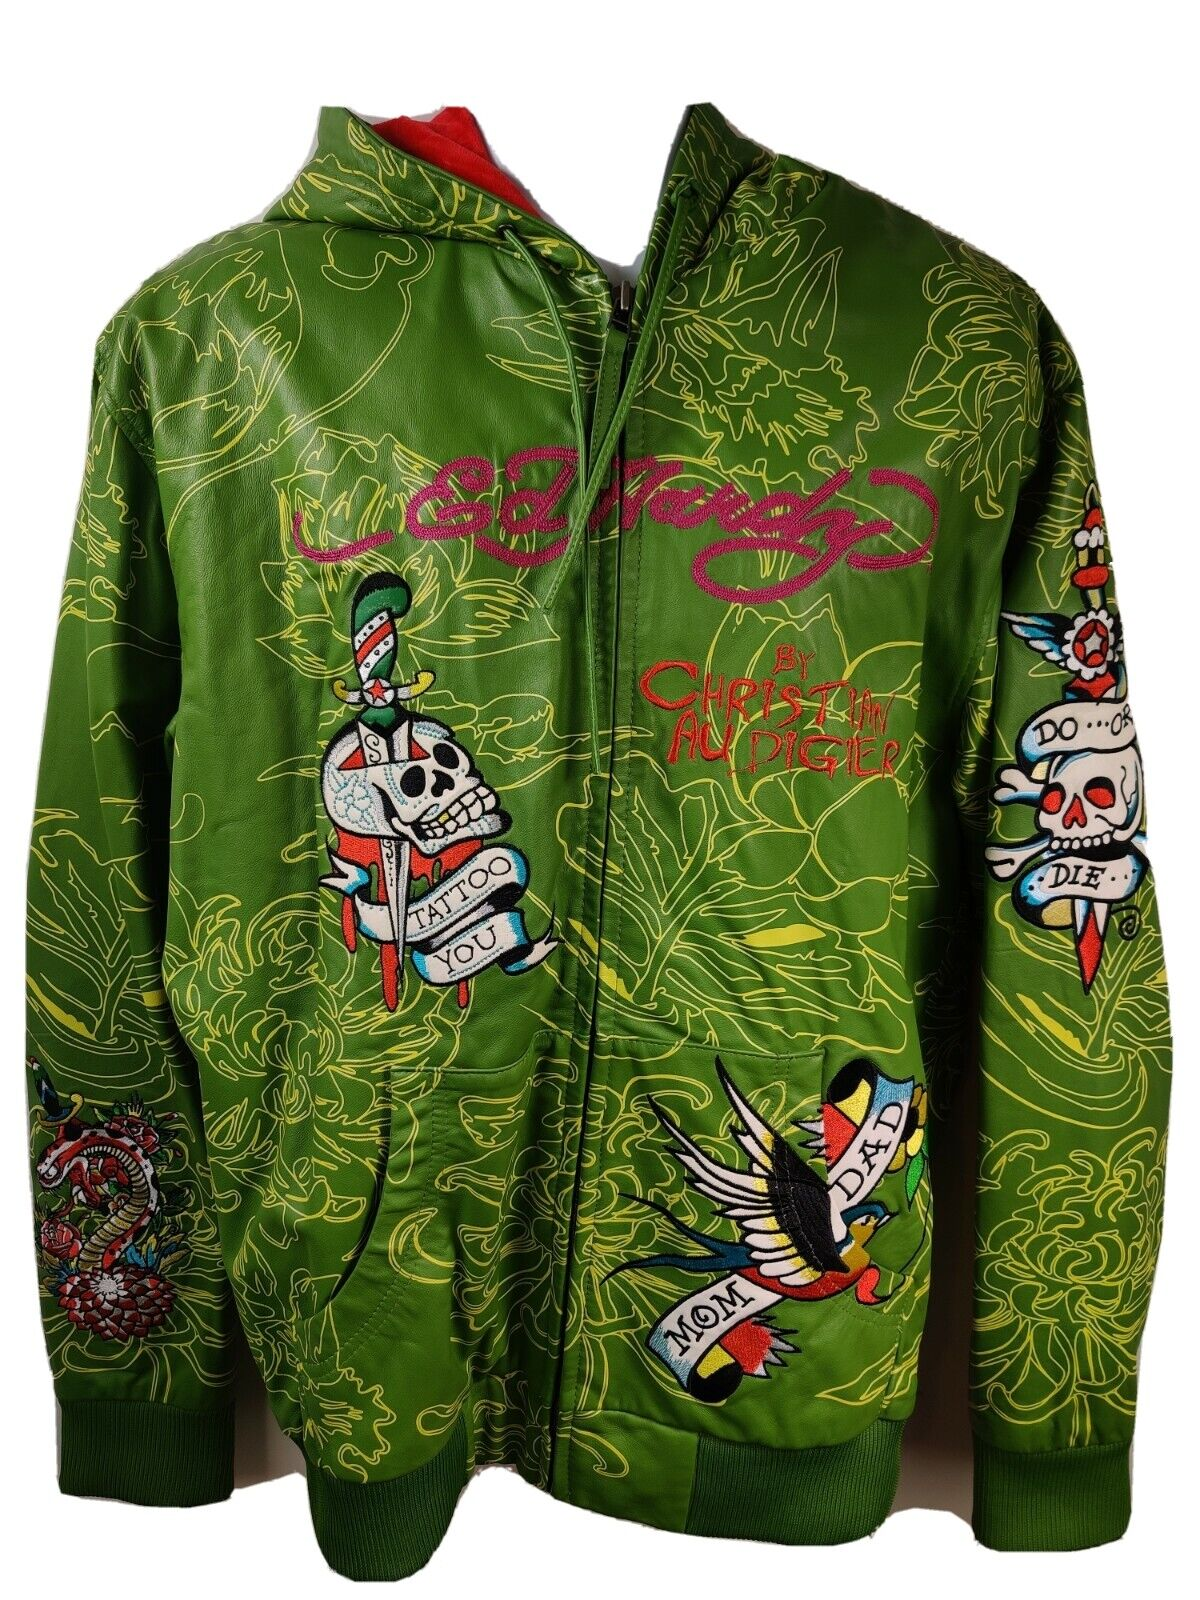 Ed Hardy Christian Audigier Mens Green Leather Hooded Jacket 2XL Do or Die Skull